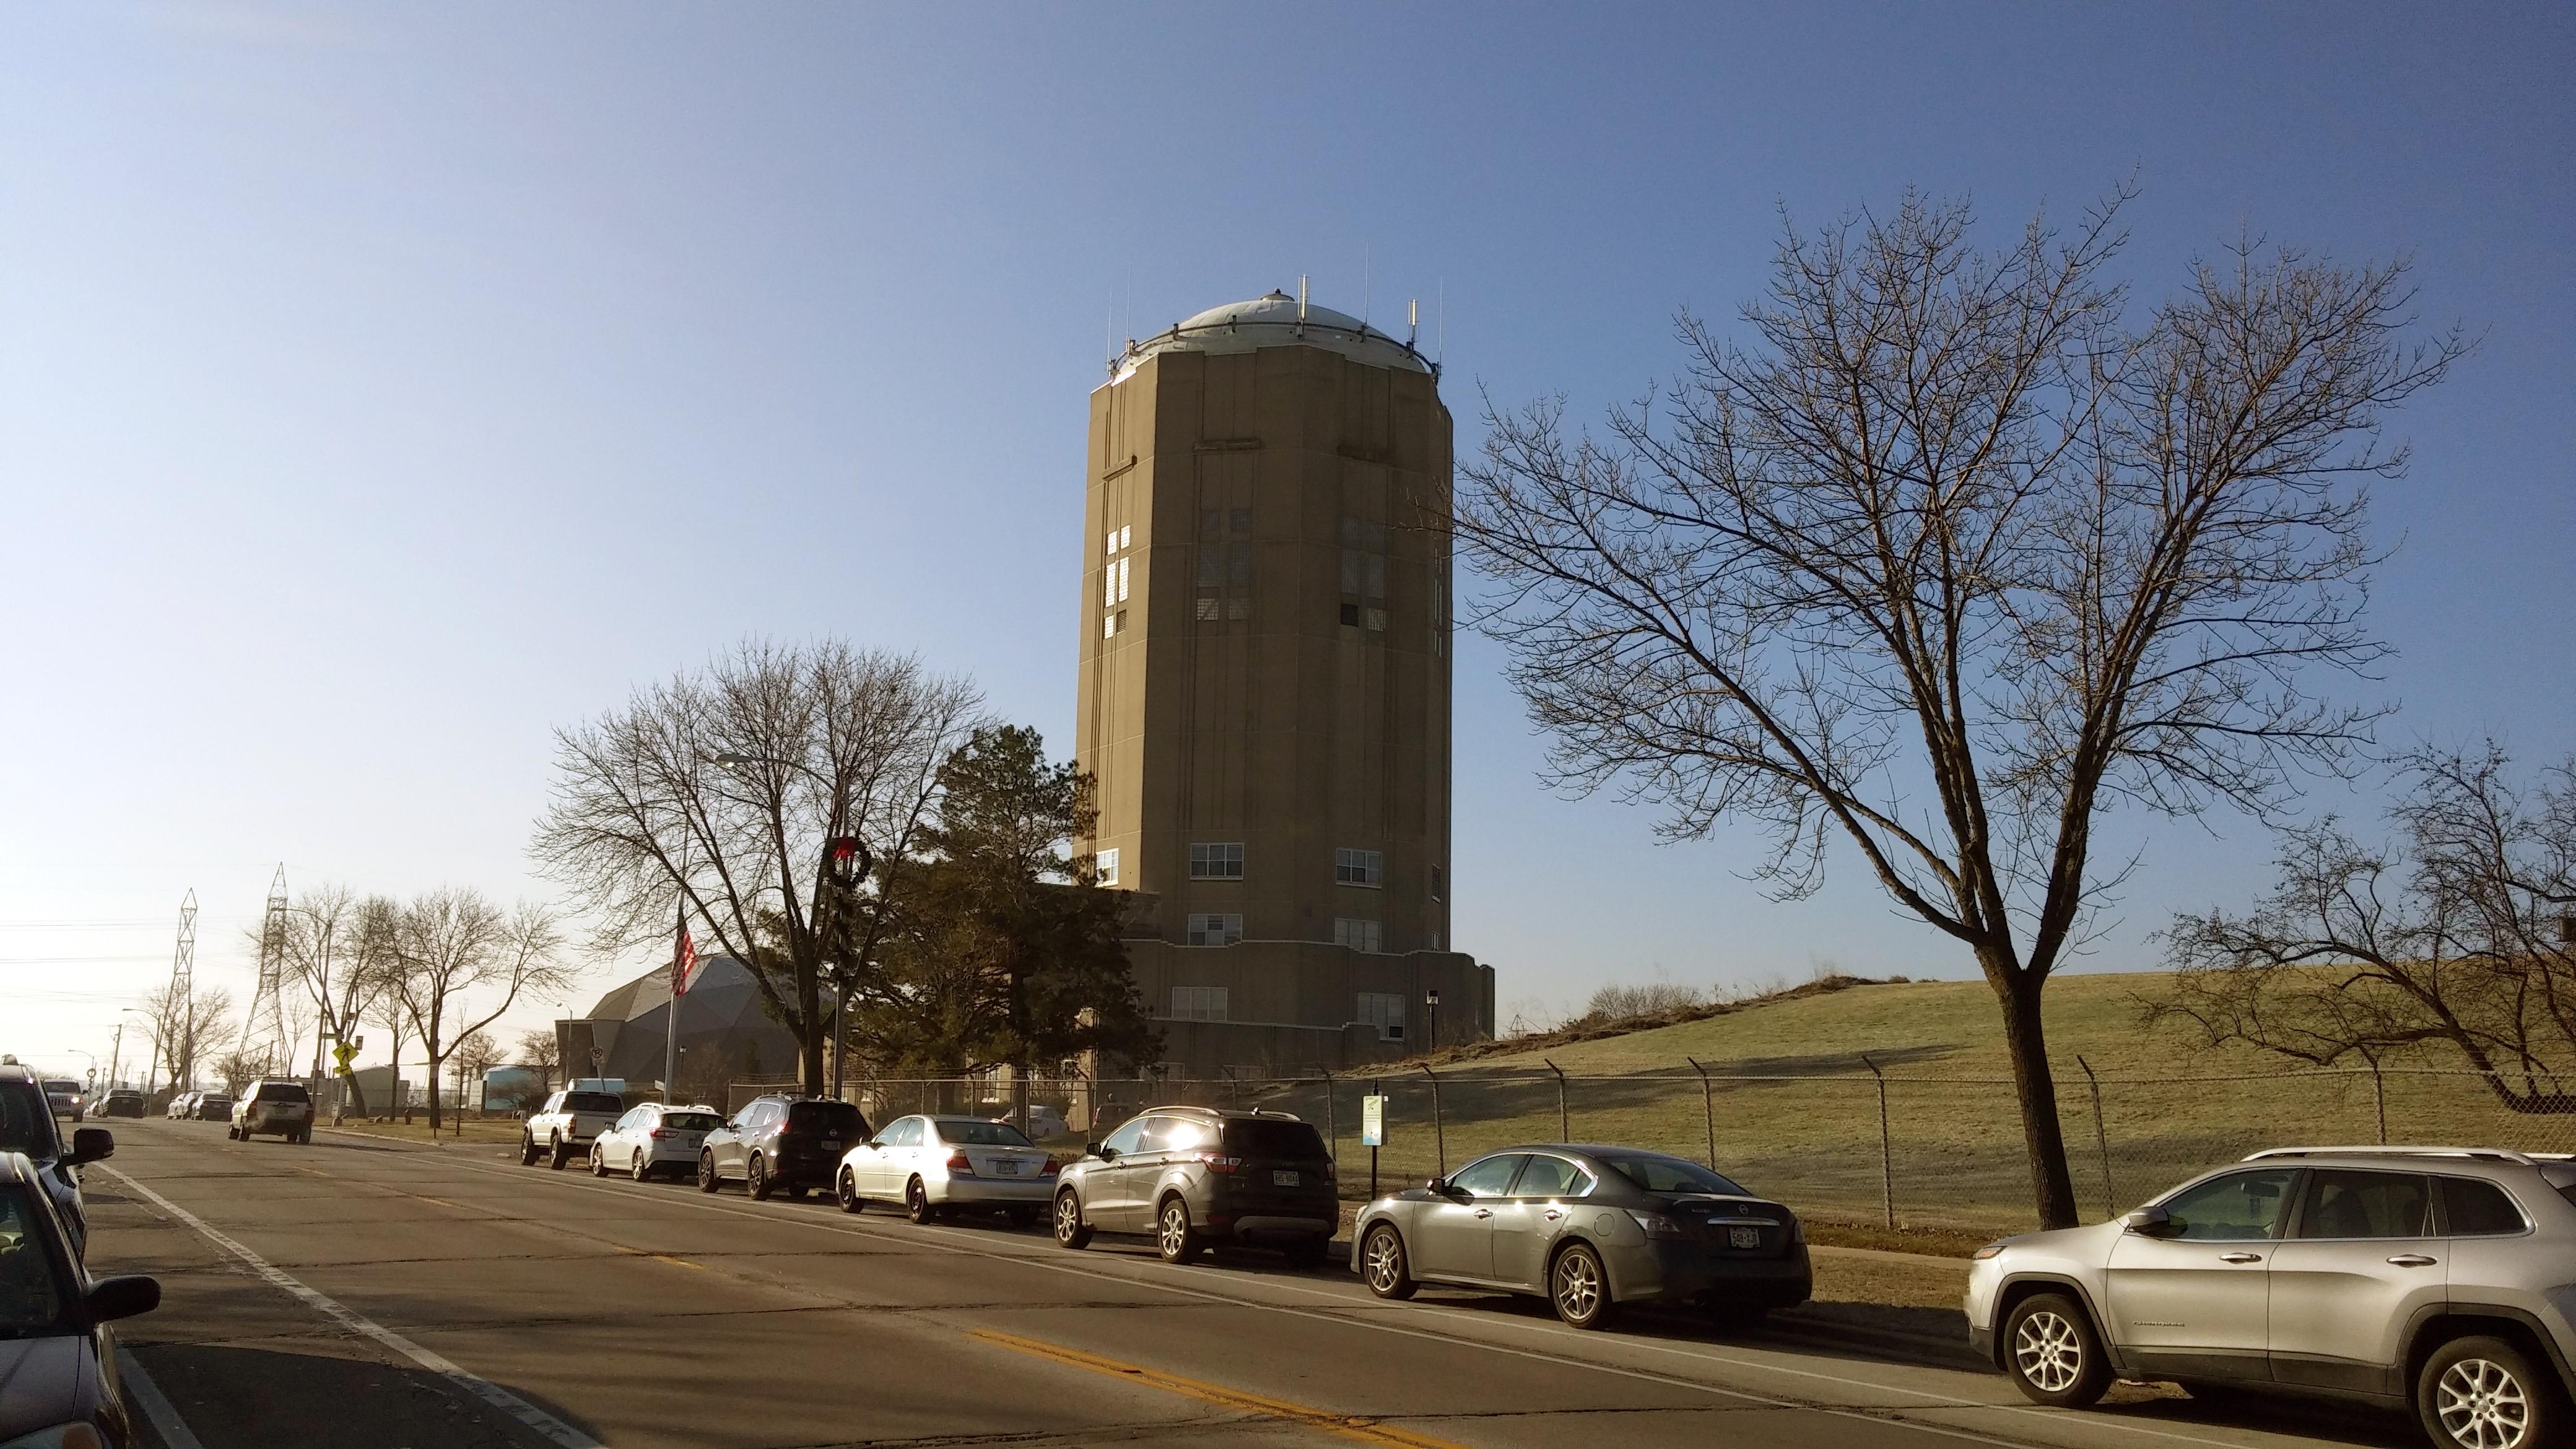 Town of Lake Water Tower. Photo taken by Carl Baehr.